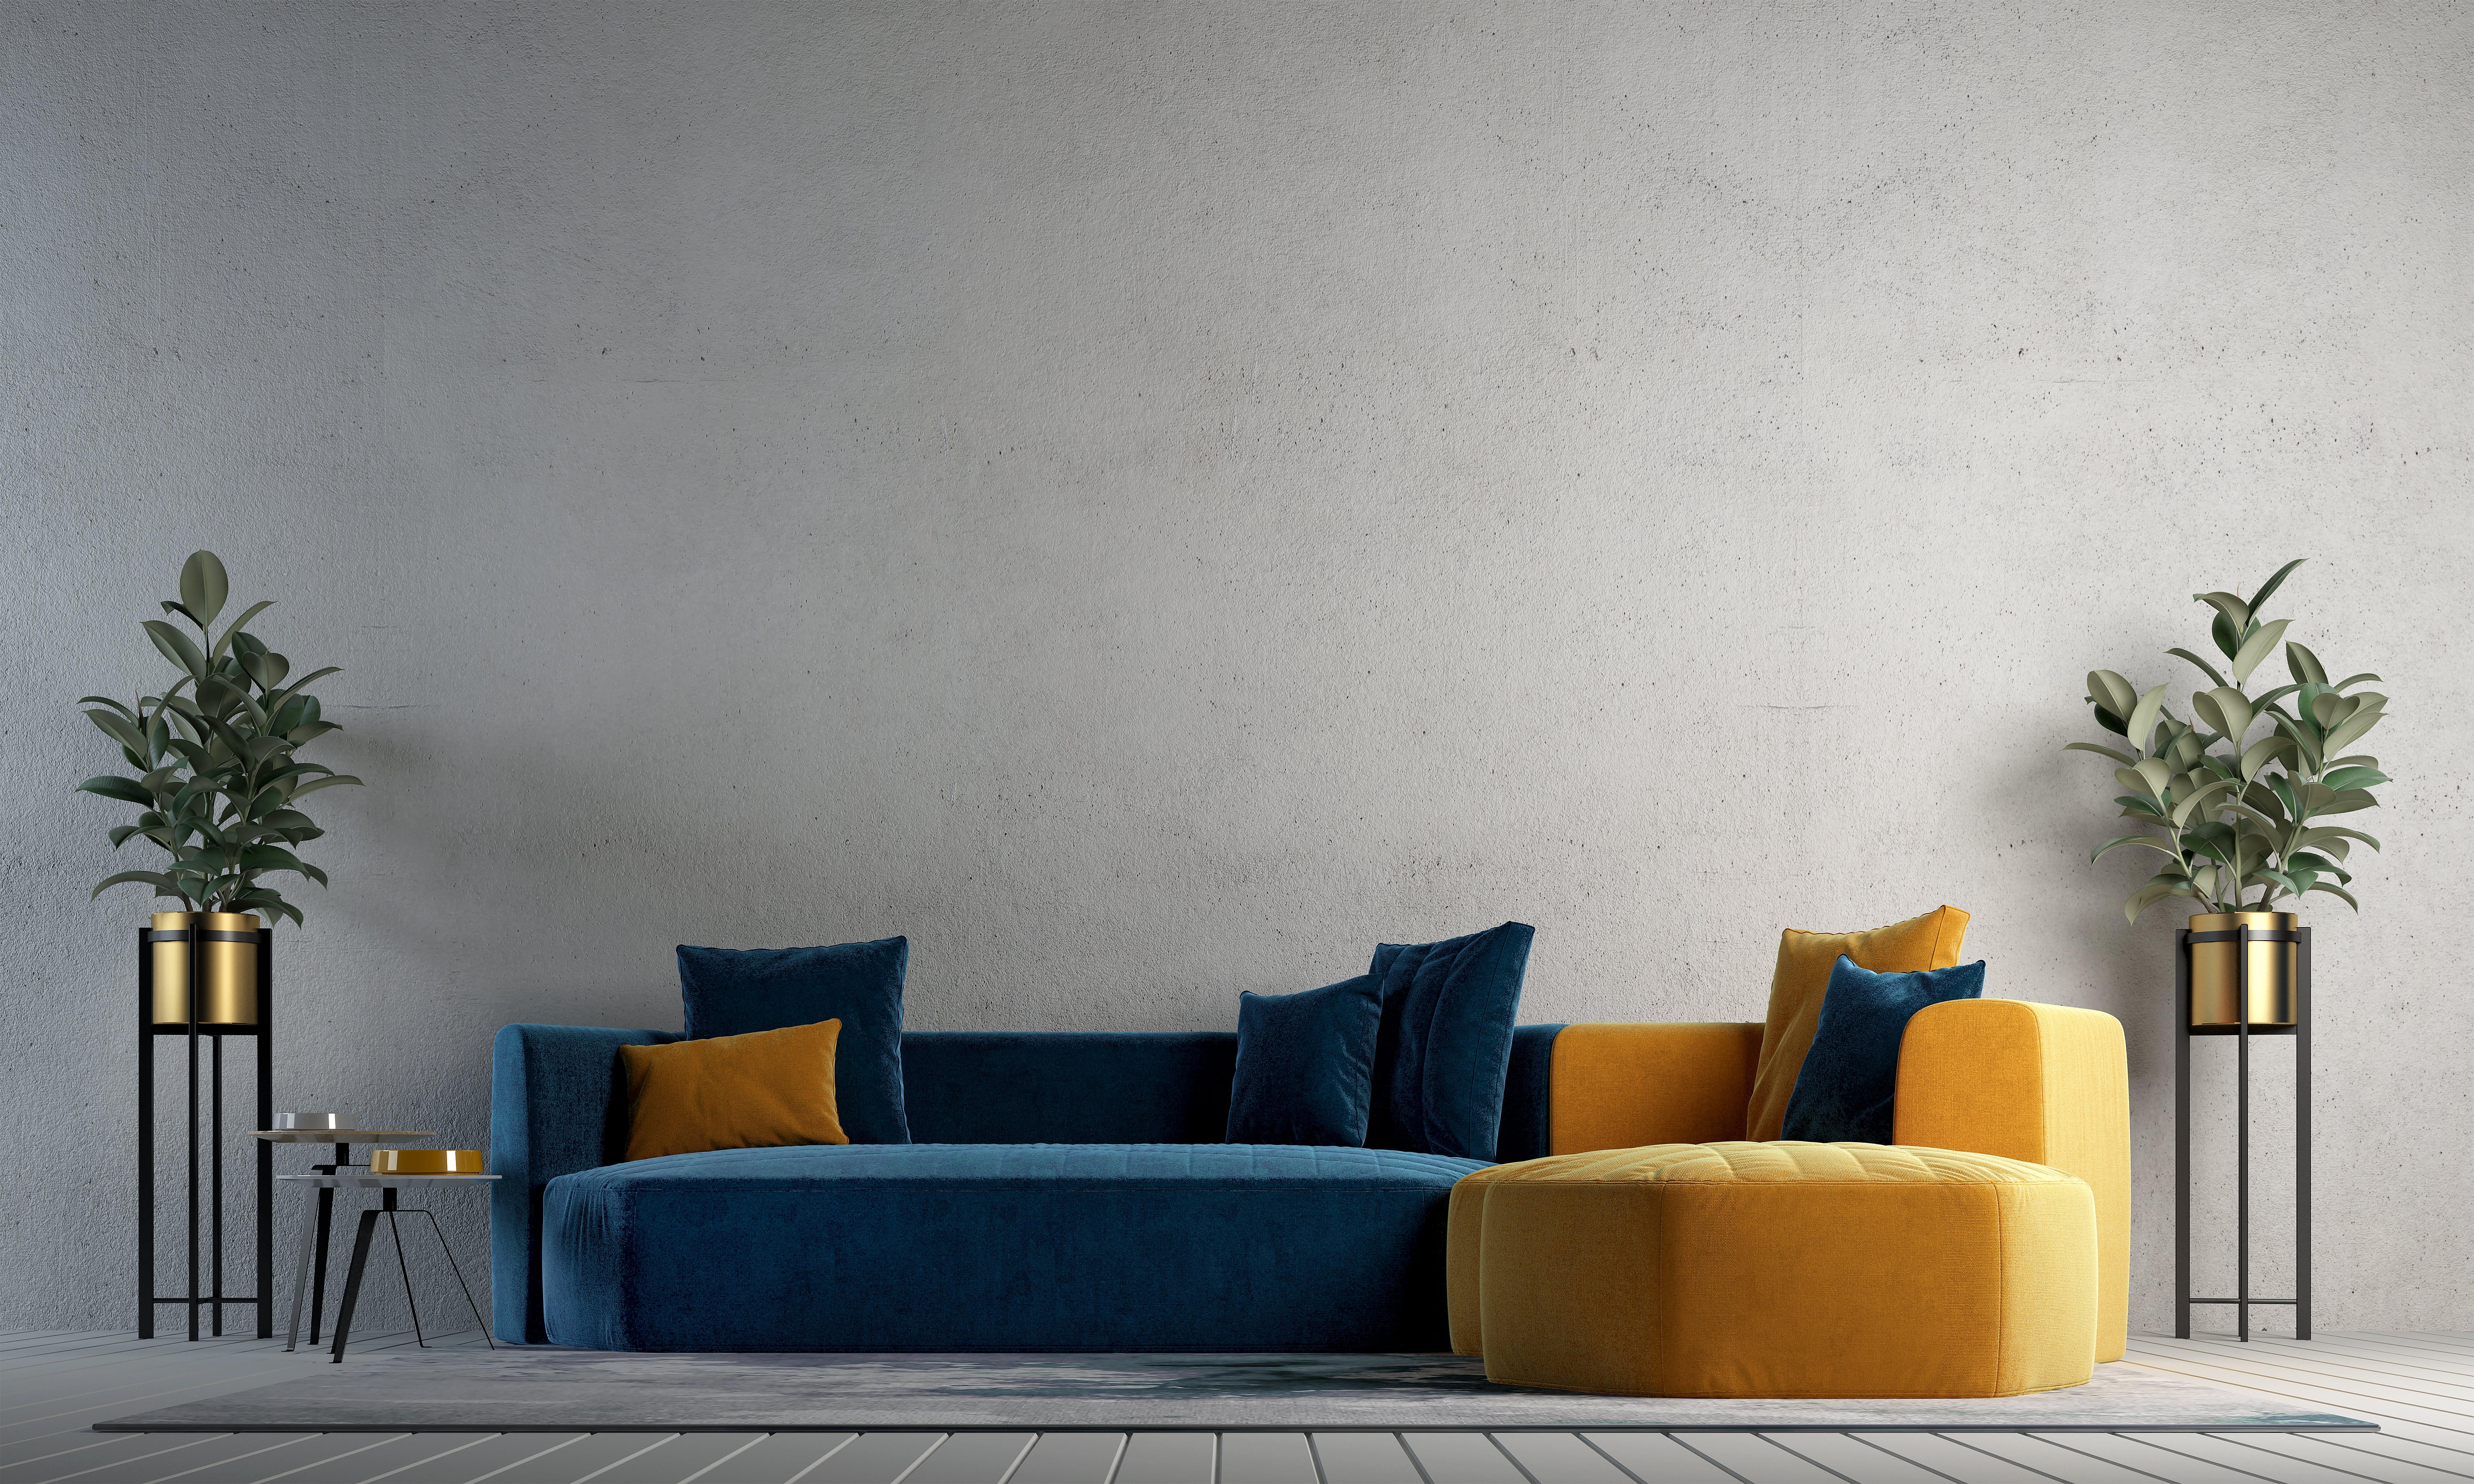 maison-corbeil_installation_automne2014_7-1500x1000